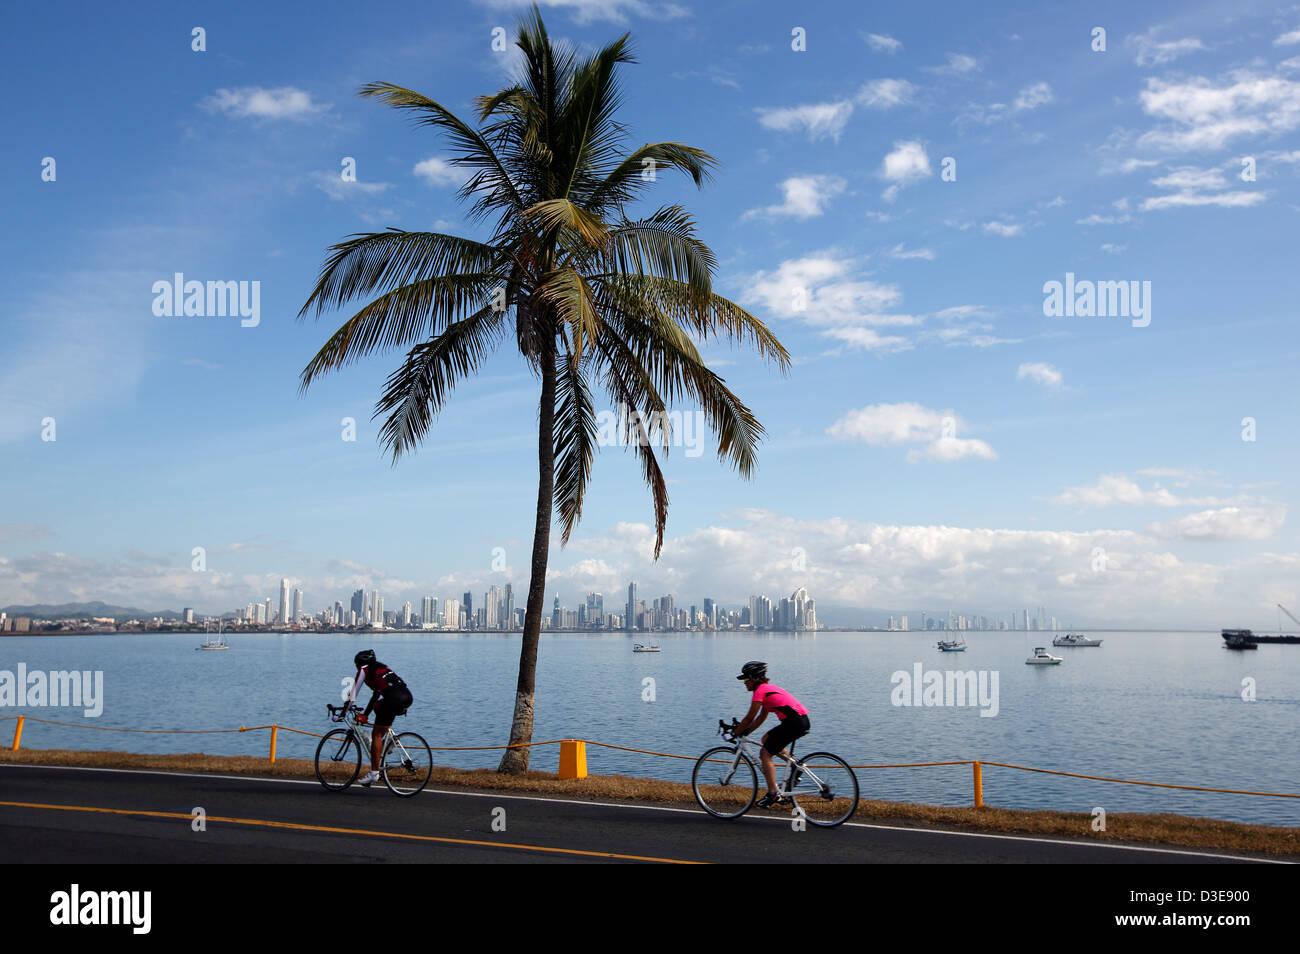 The Causeway, Amador, Panama City, Panama - Stock Image